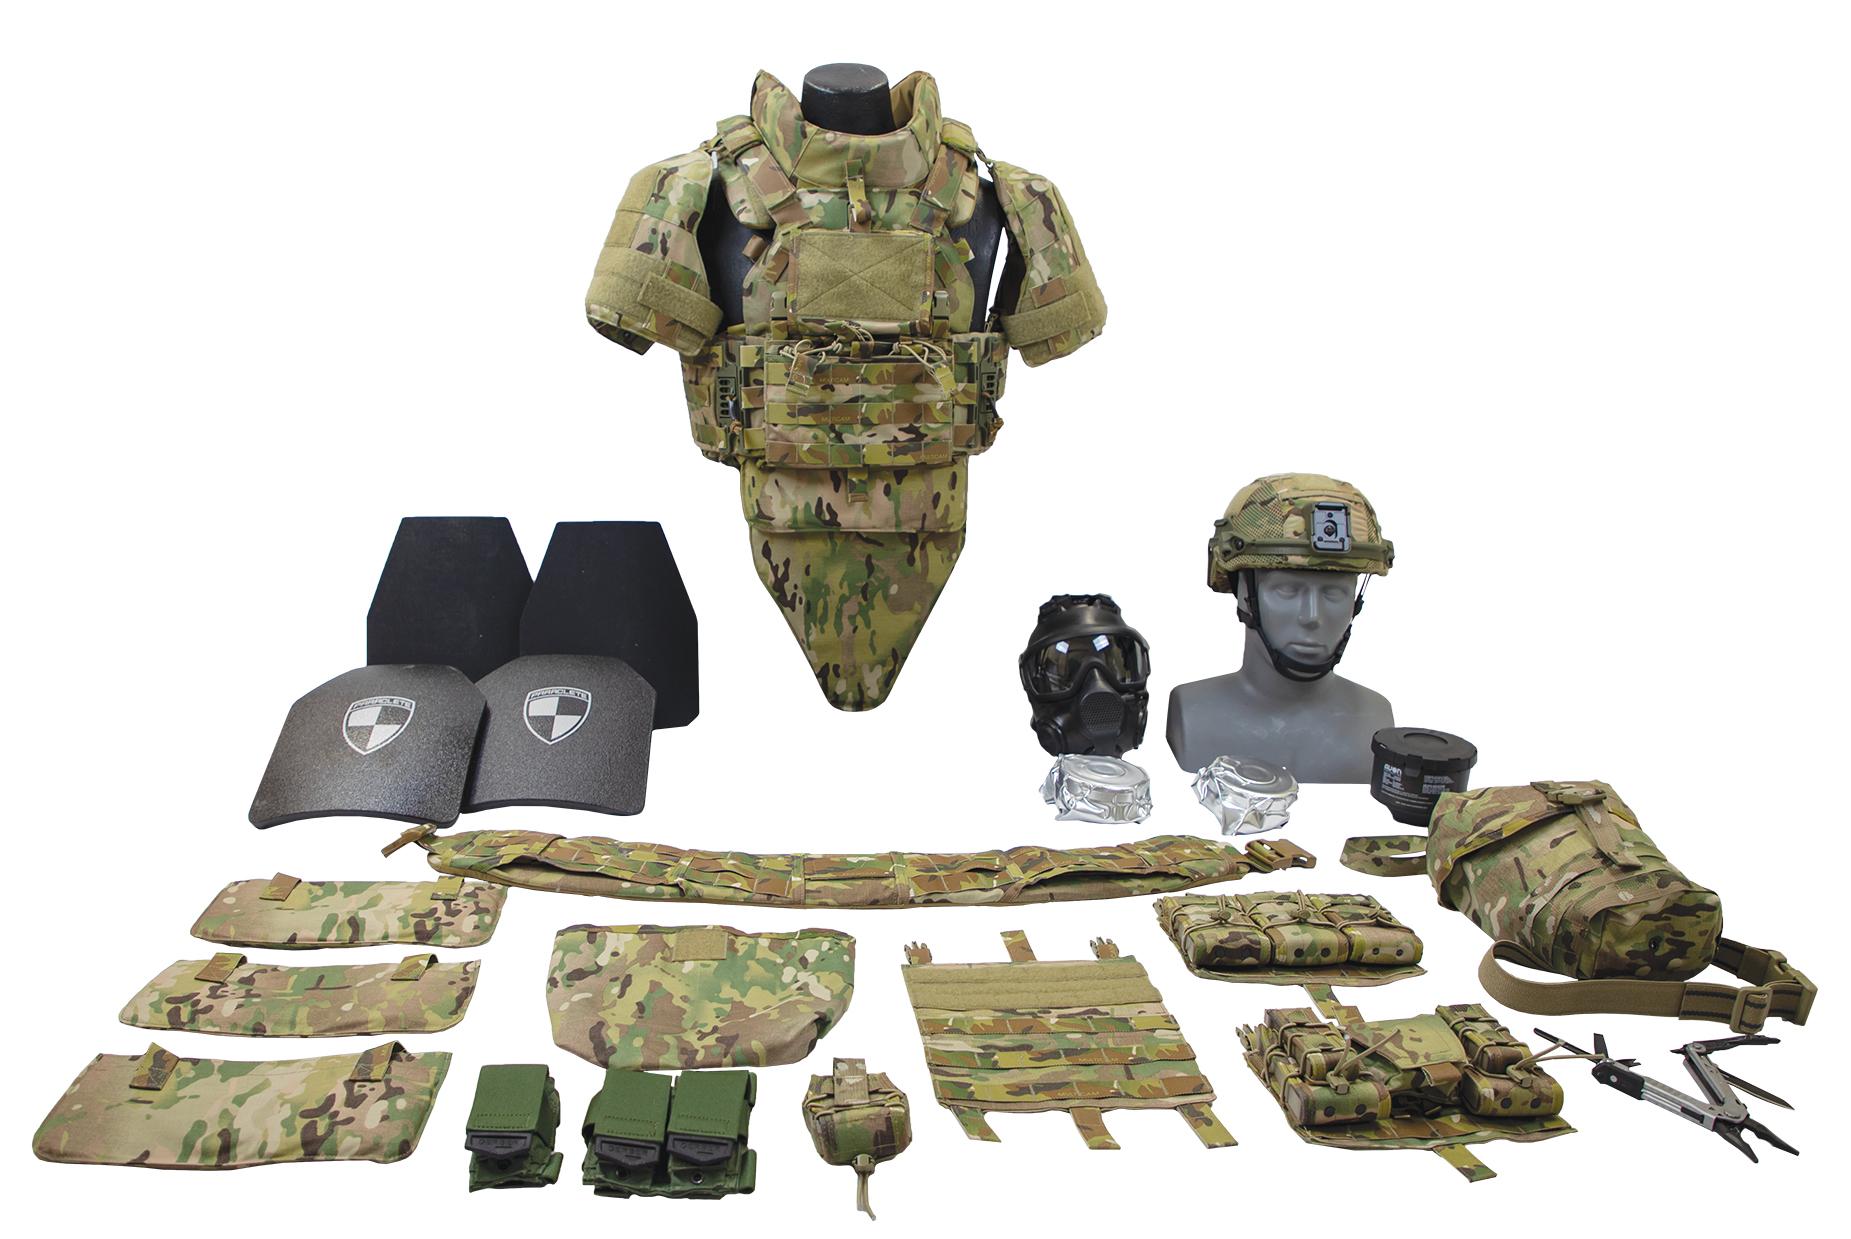 ICE_body_armor_layout.jpg